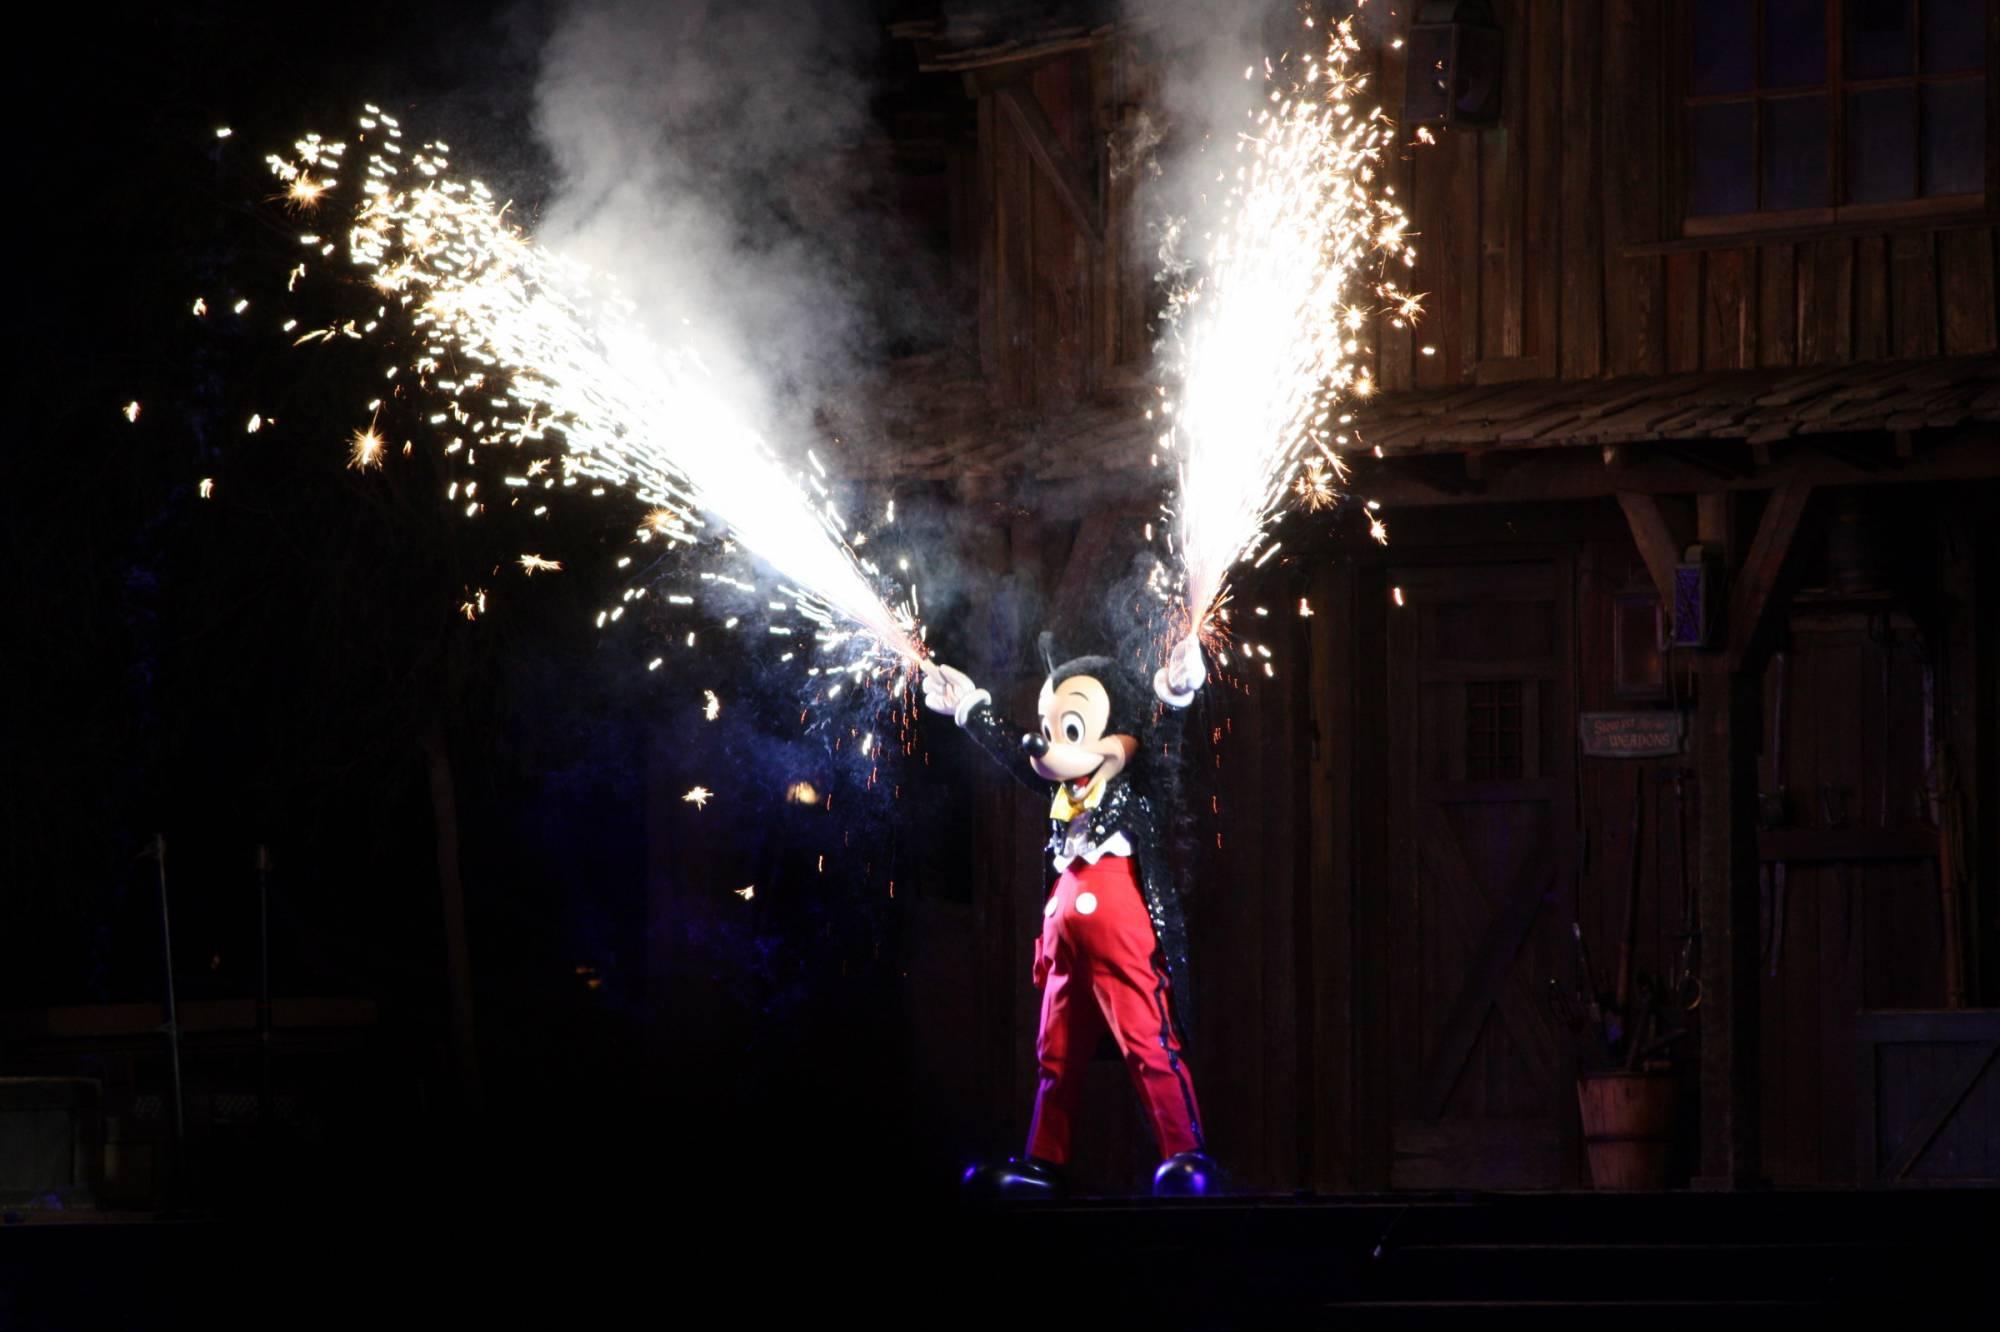 Mickey during Fantasmic